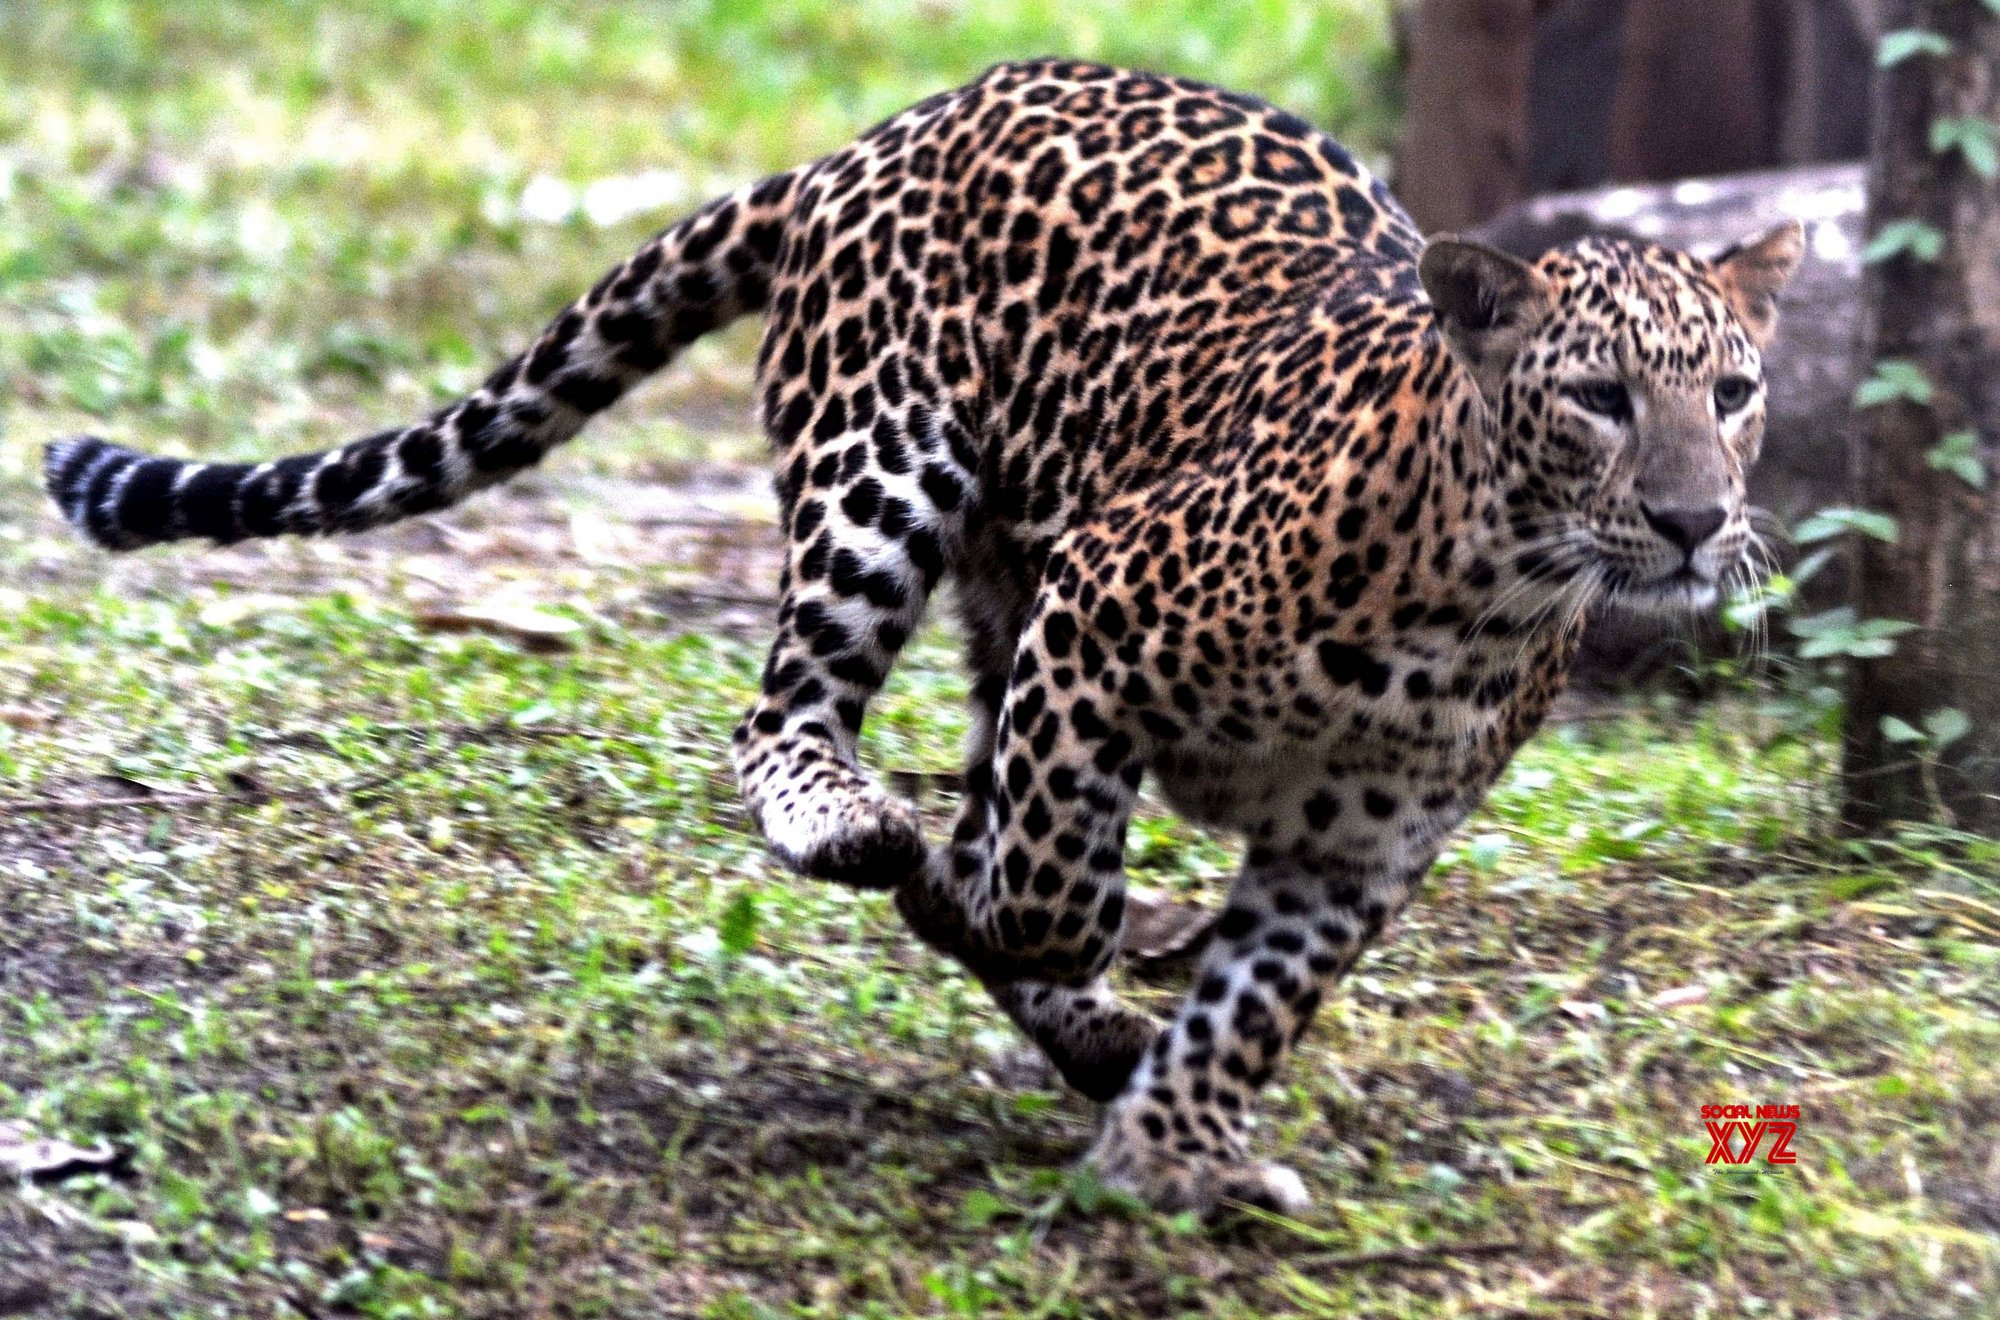 Anti-leopard attack advisory says 'play loud music', 'wear helmets'